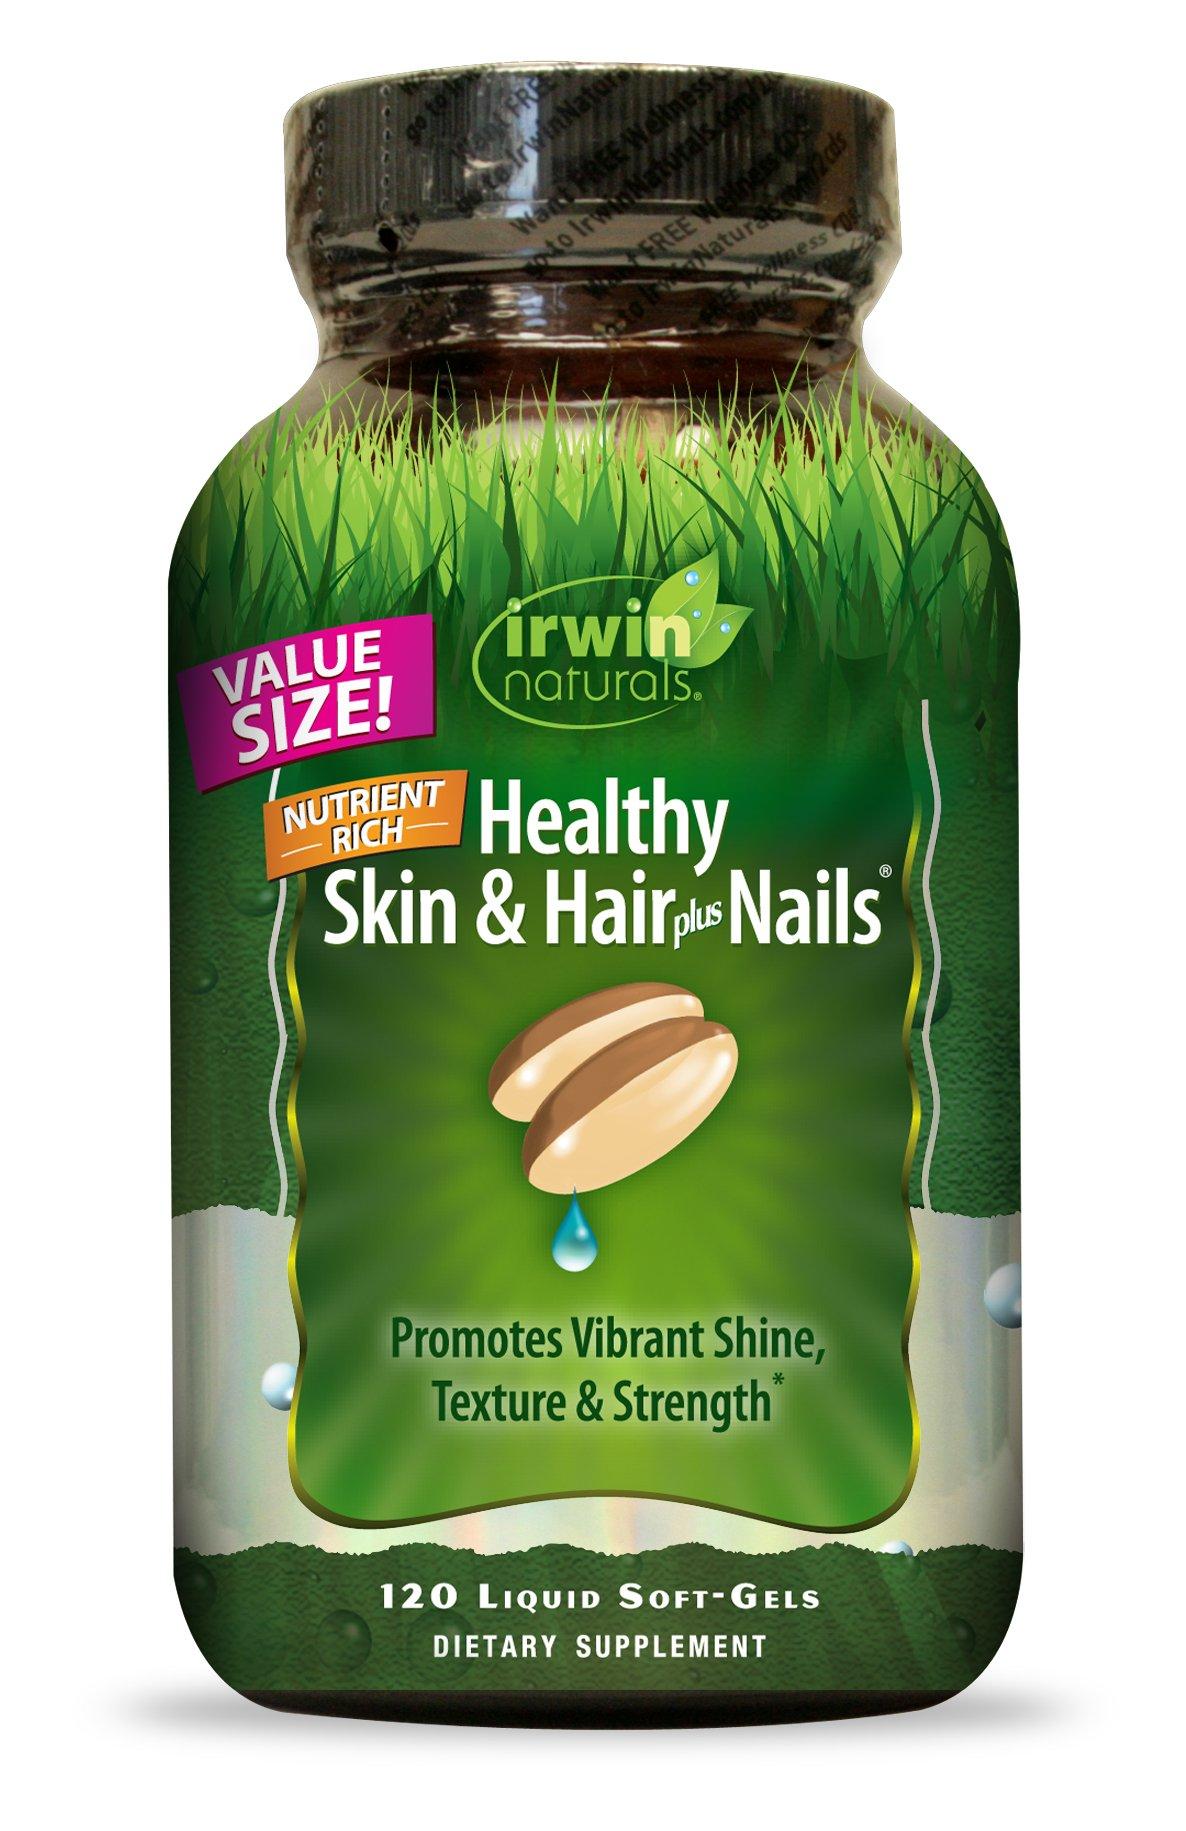 Irwin Naturals Nutrient Rich Healthy Skin & Hair Plus Nails - Promotes Vibrant Shine Texture & Strength - 120 Liquid Softgels